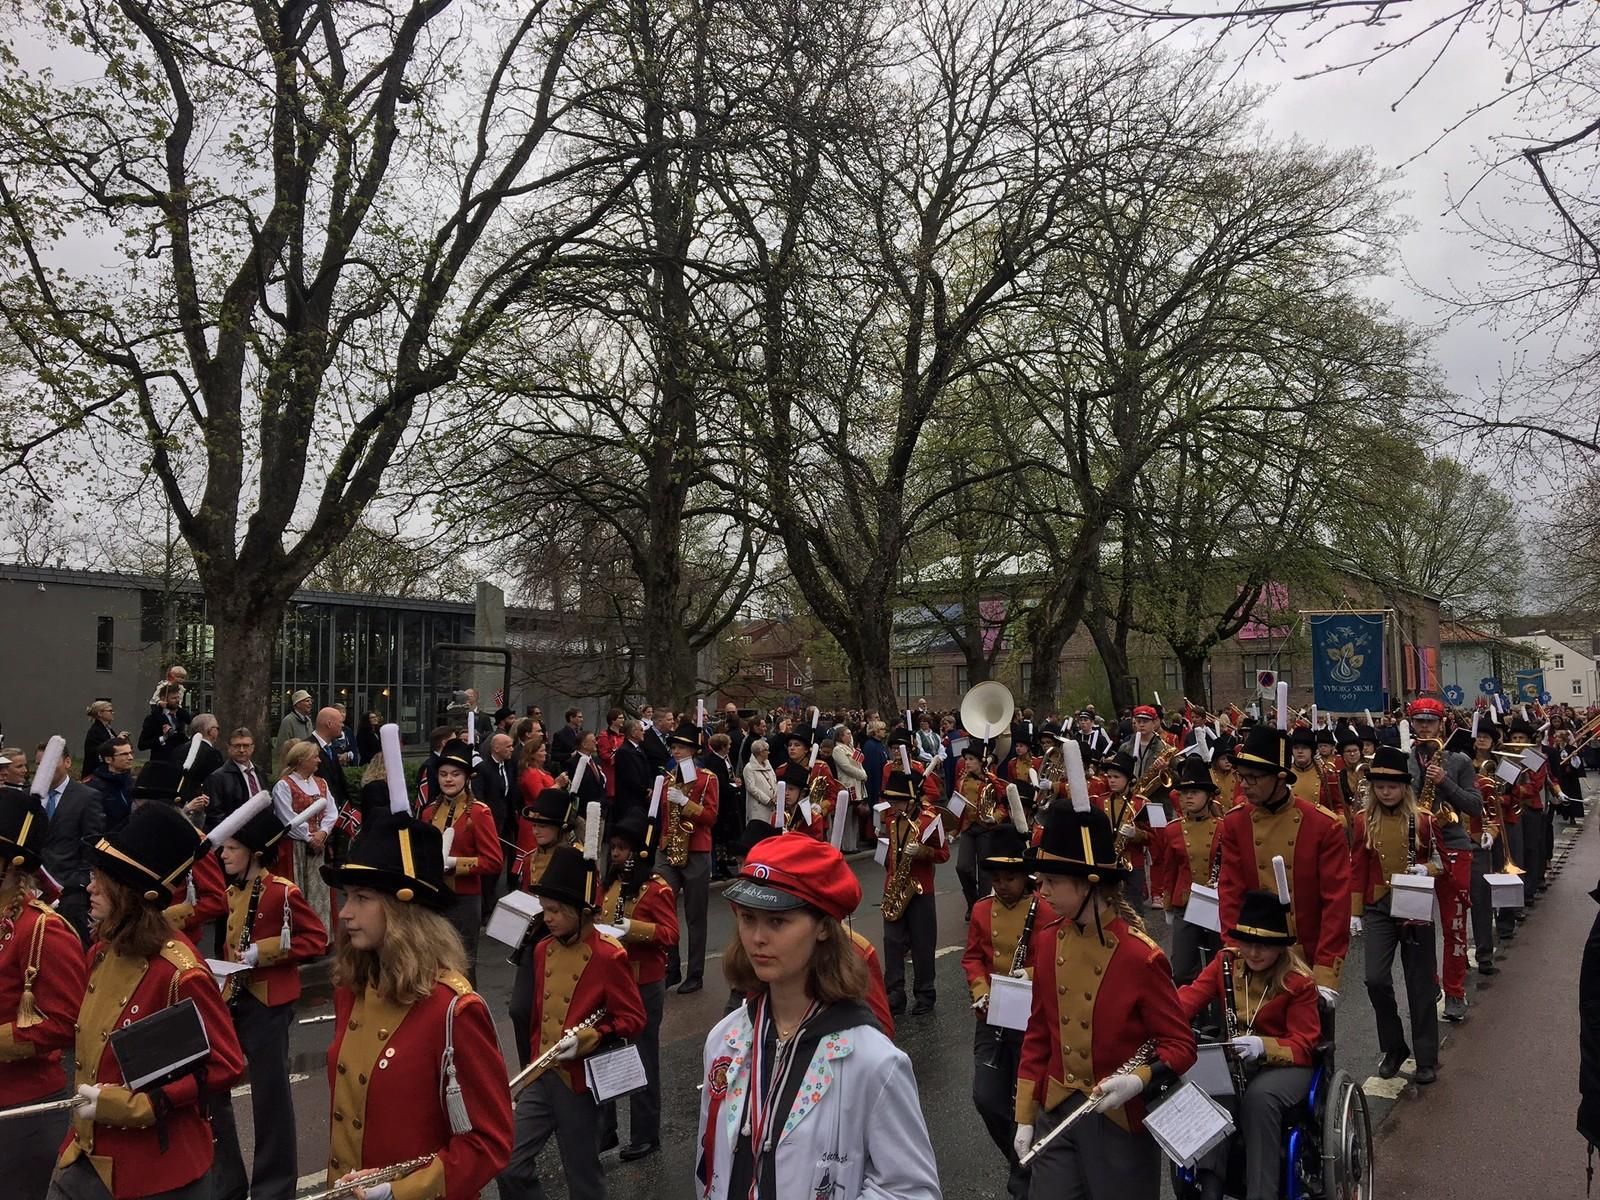 17.mai-feiring i Trondheim.